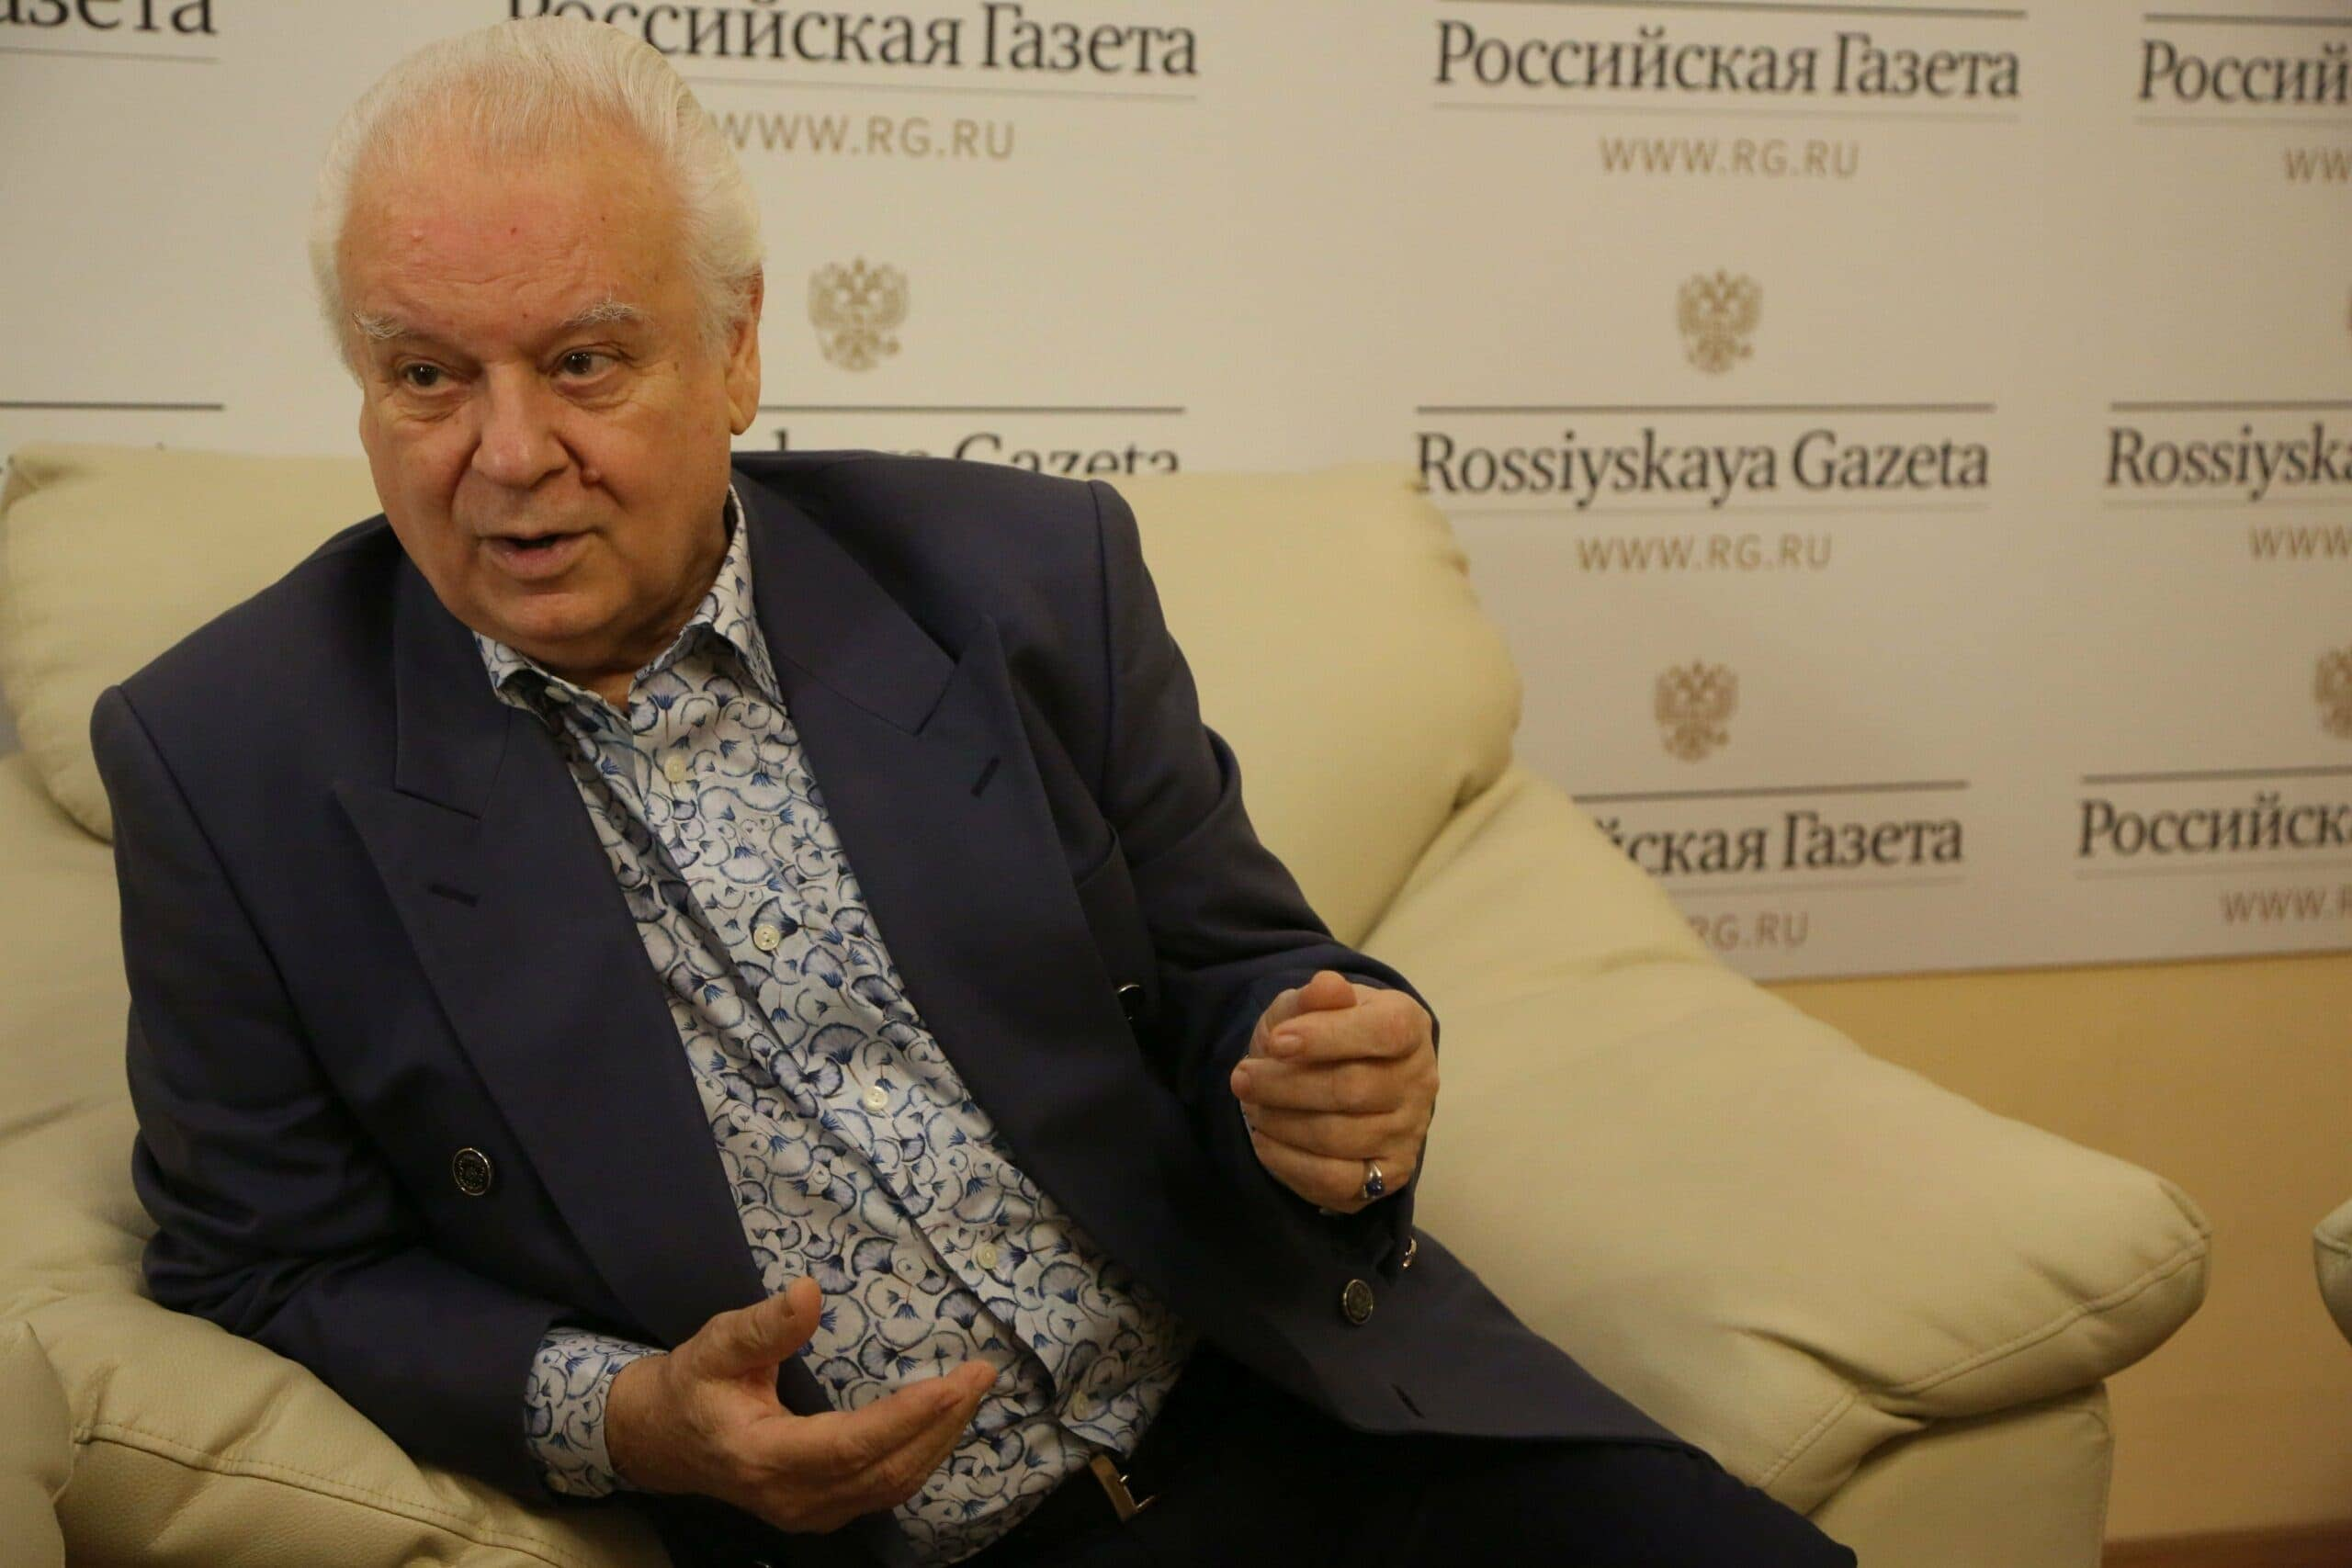 Юрий Симонов. Фото - Анжела Мнацаканян/ РГ